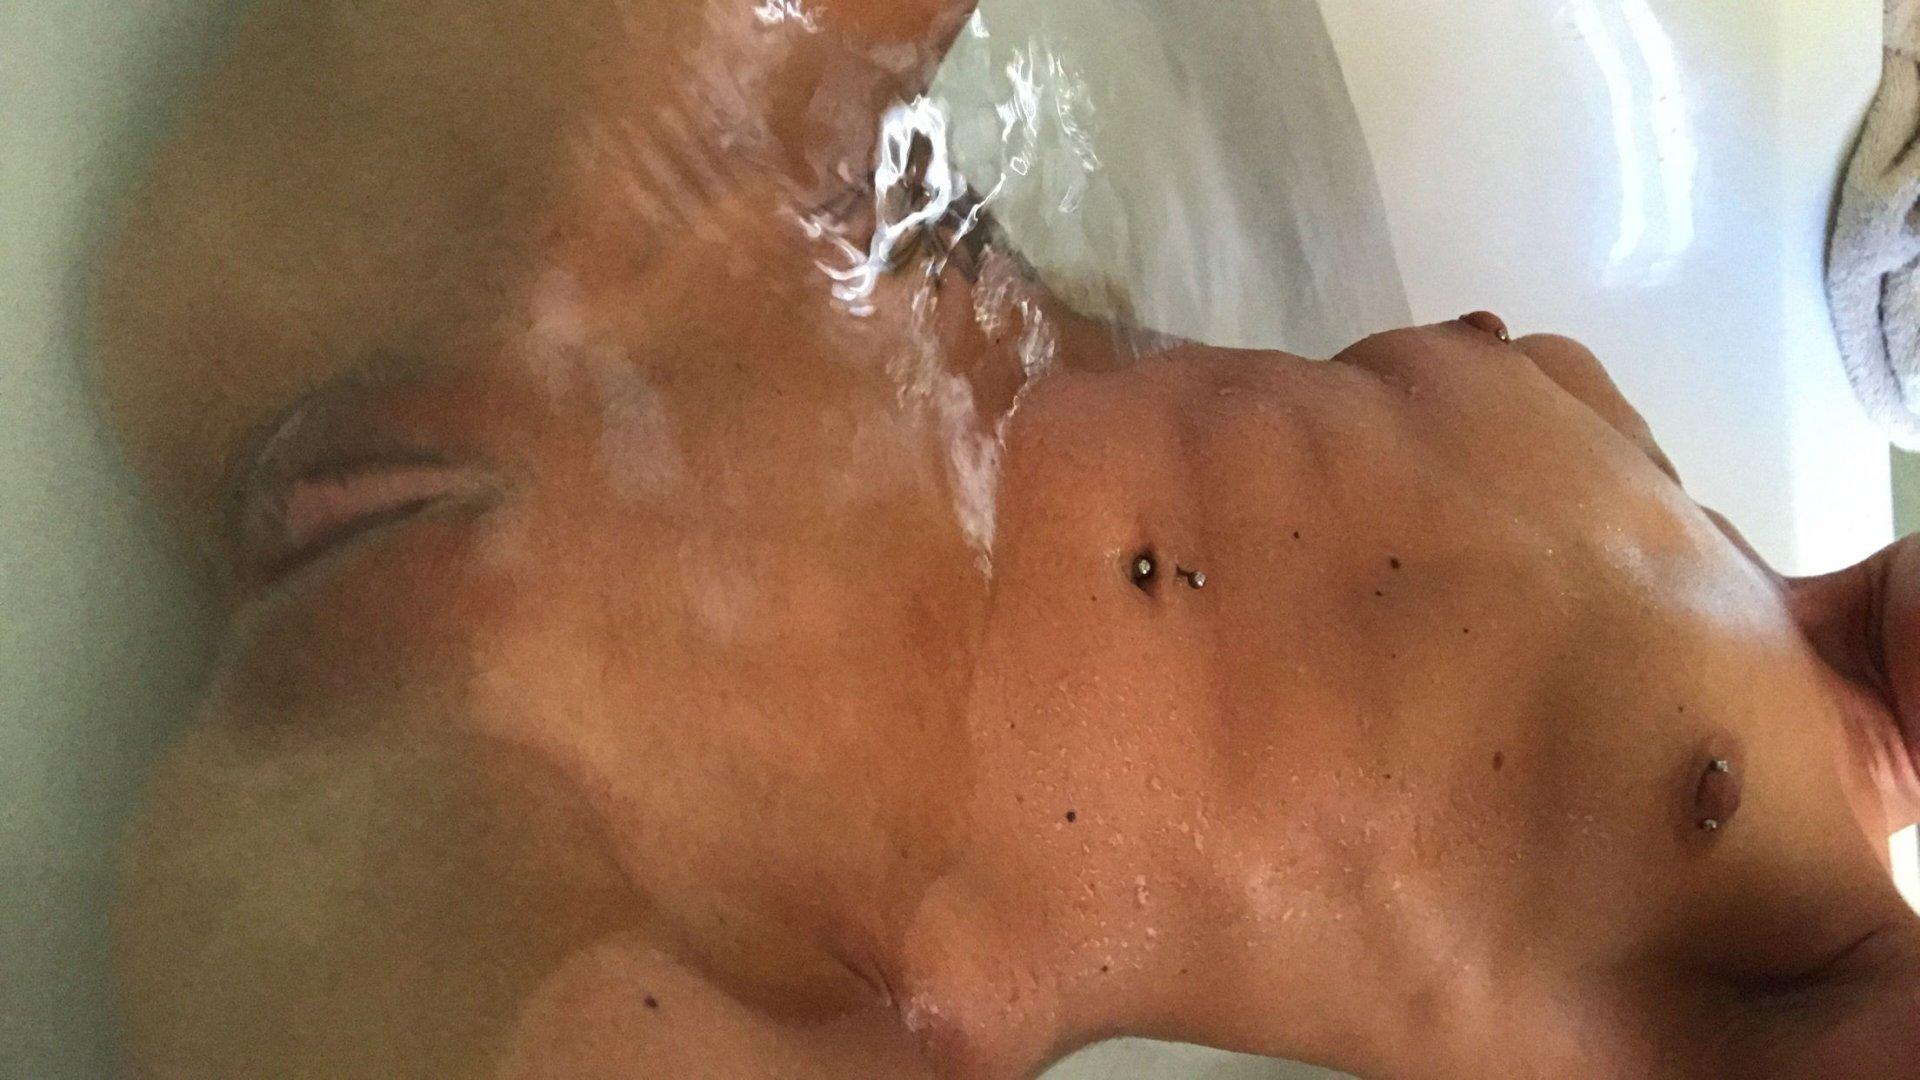 Cameron-Canela-Naked-TheFappeningBlog.com-27.jpg